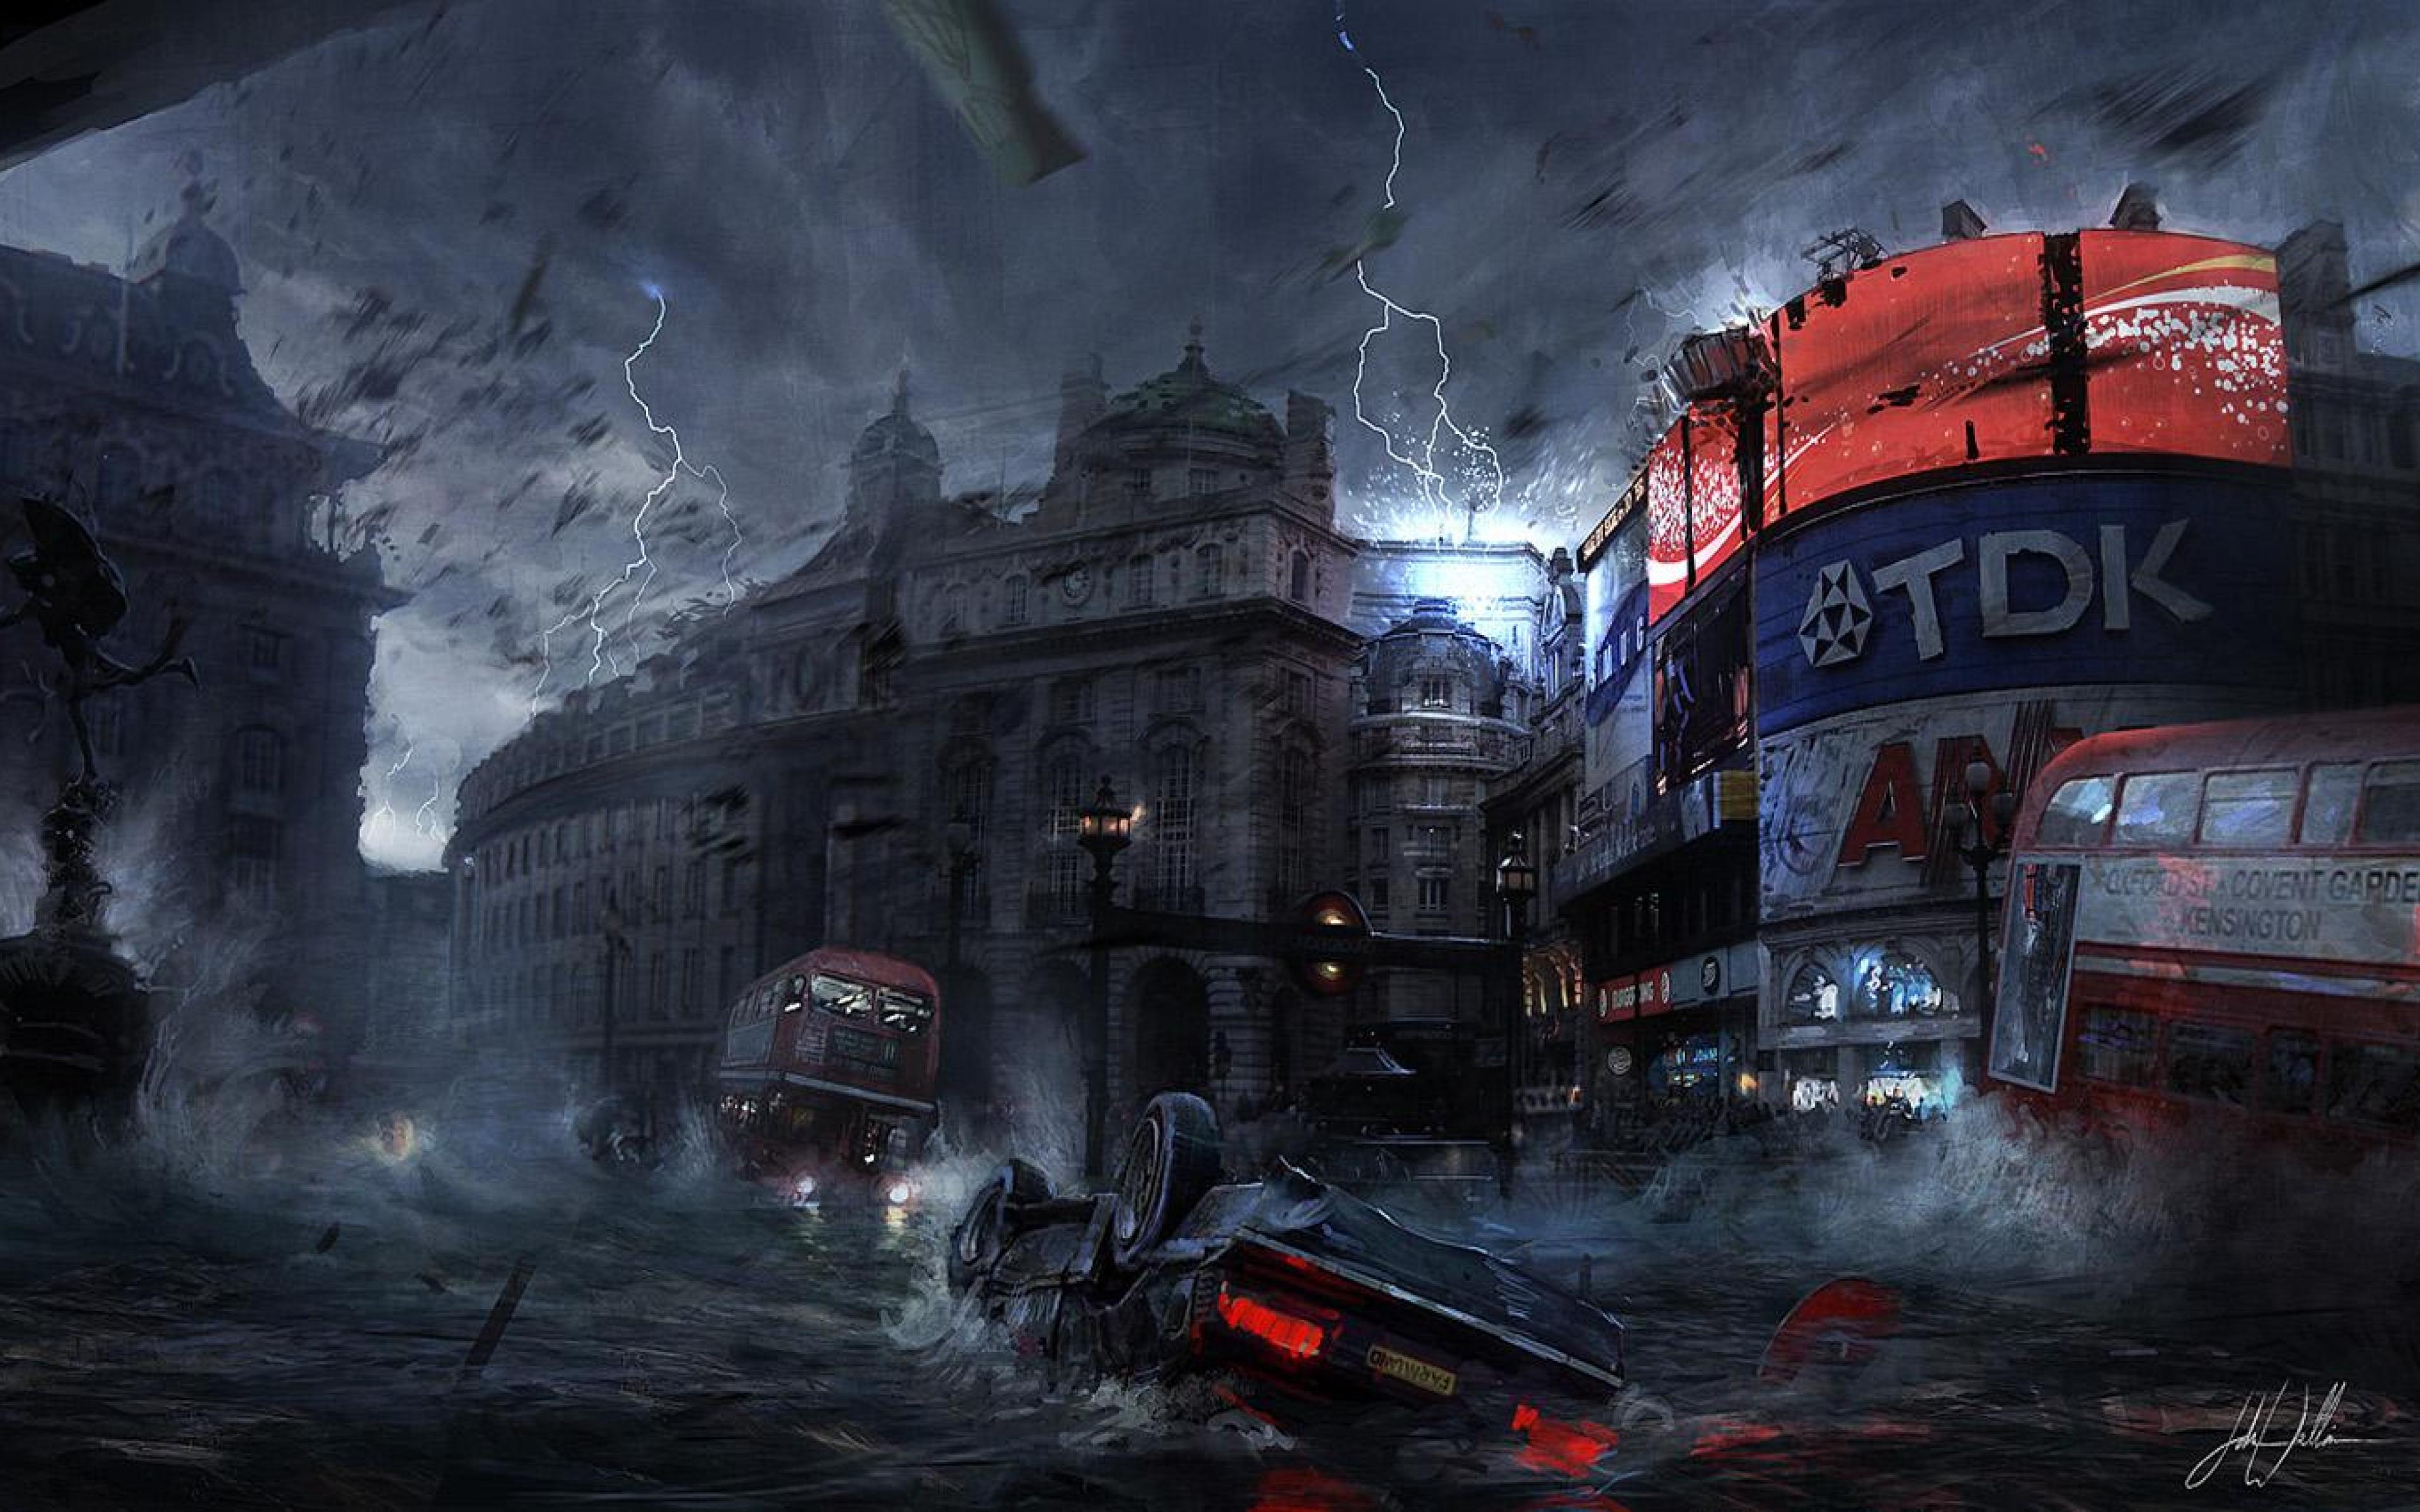 3840x2400-end_of_world_sci_fi_apocalyptic_end_apocalypse-11564